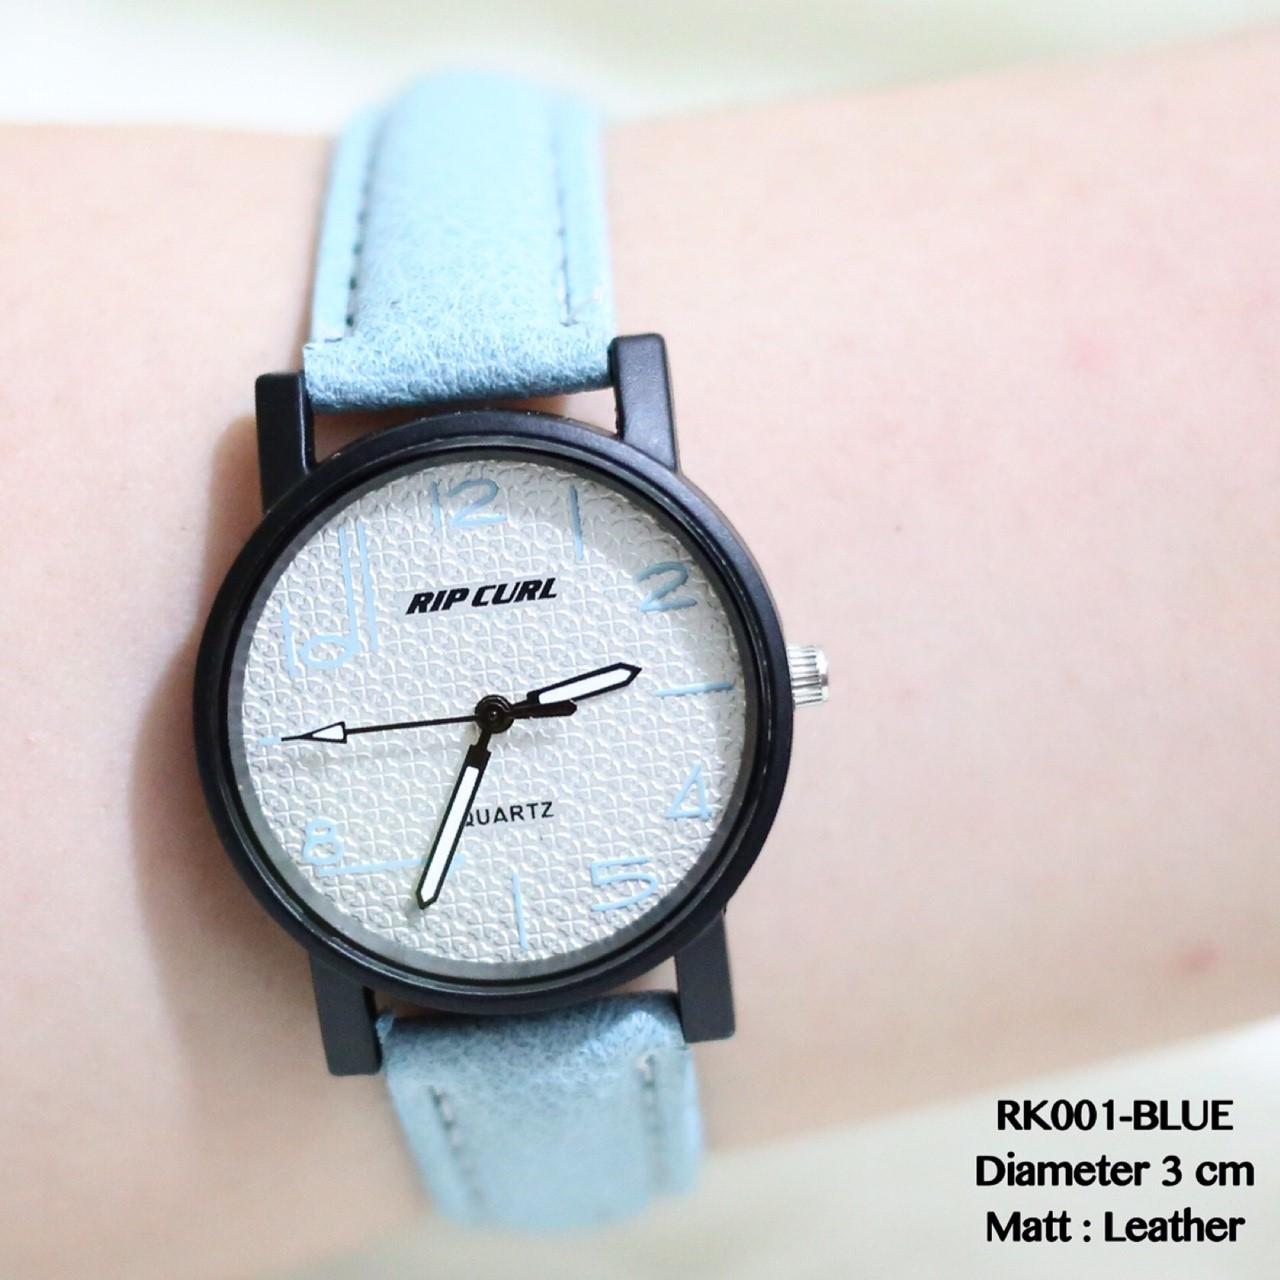 jam tangan ripcurl wanita leather kulit casual watch grosir murah dkny